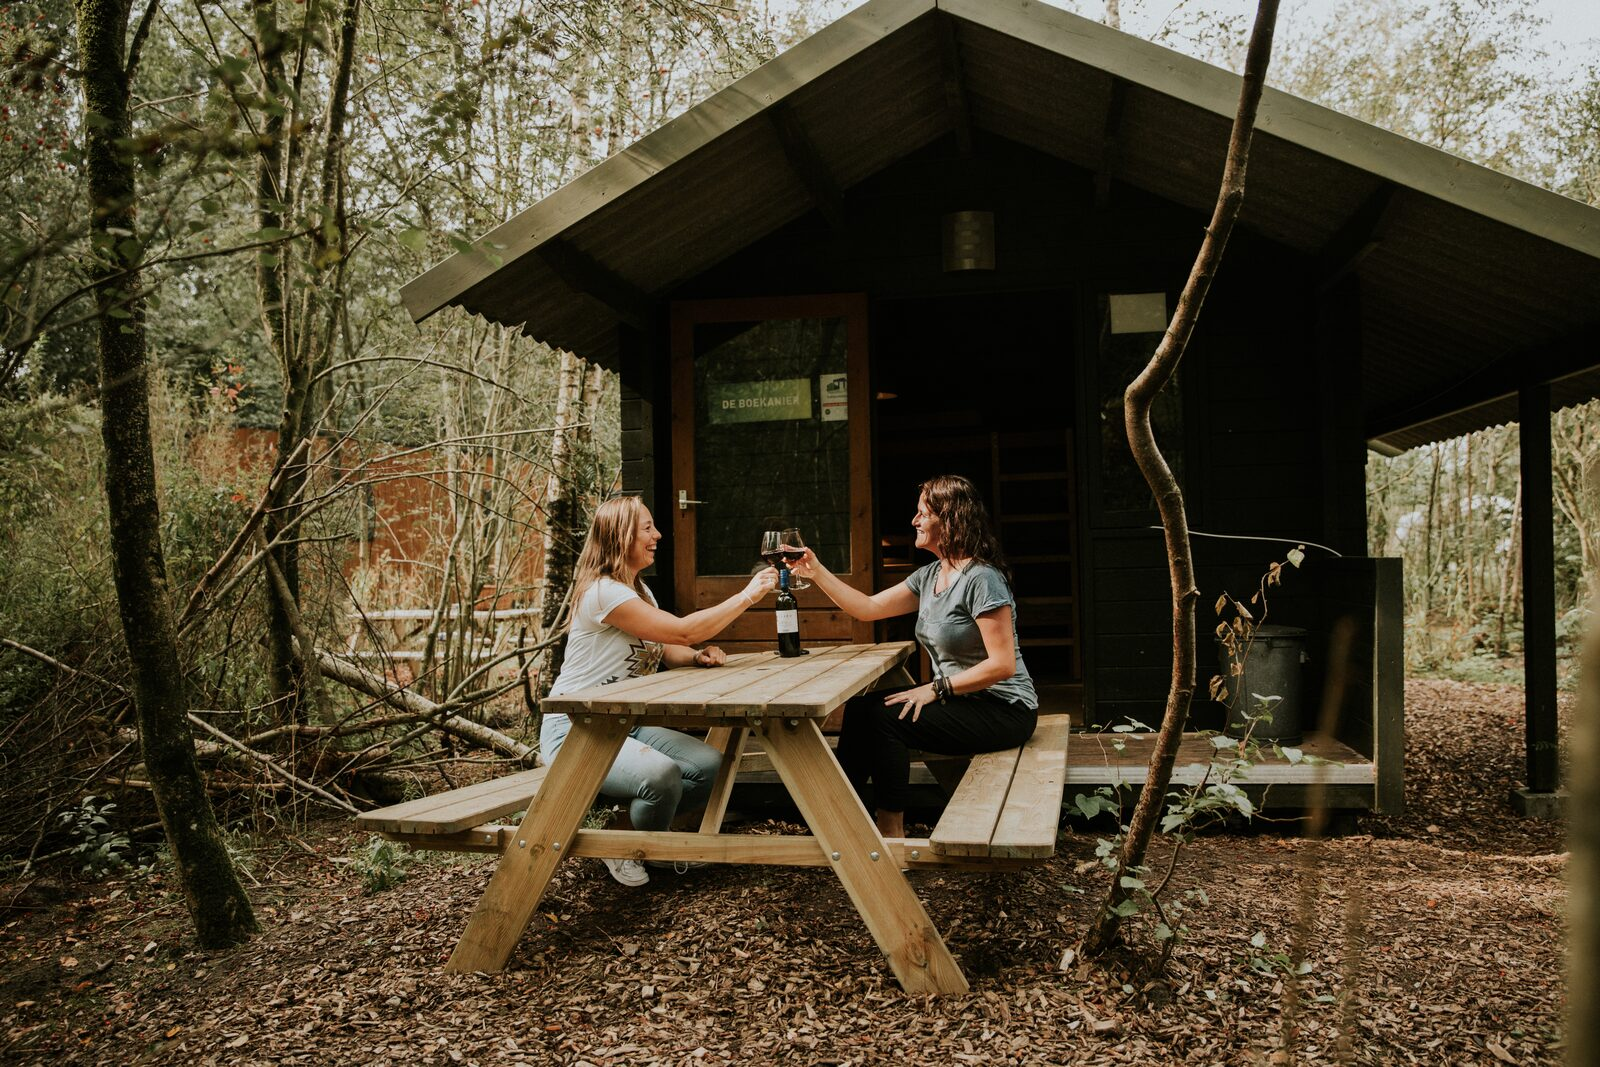 Camping met trekkershut